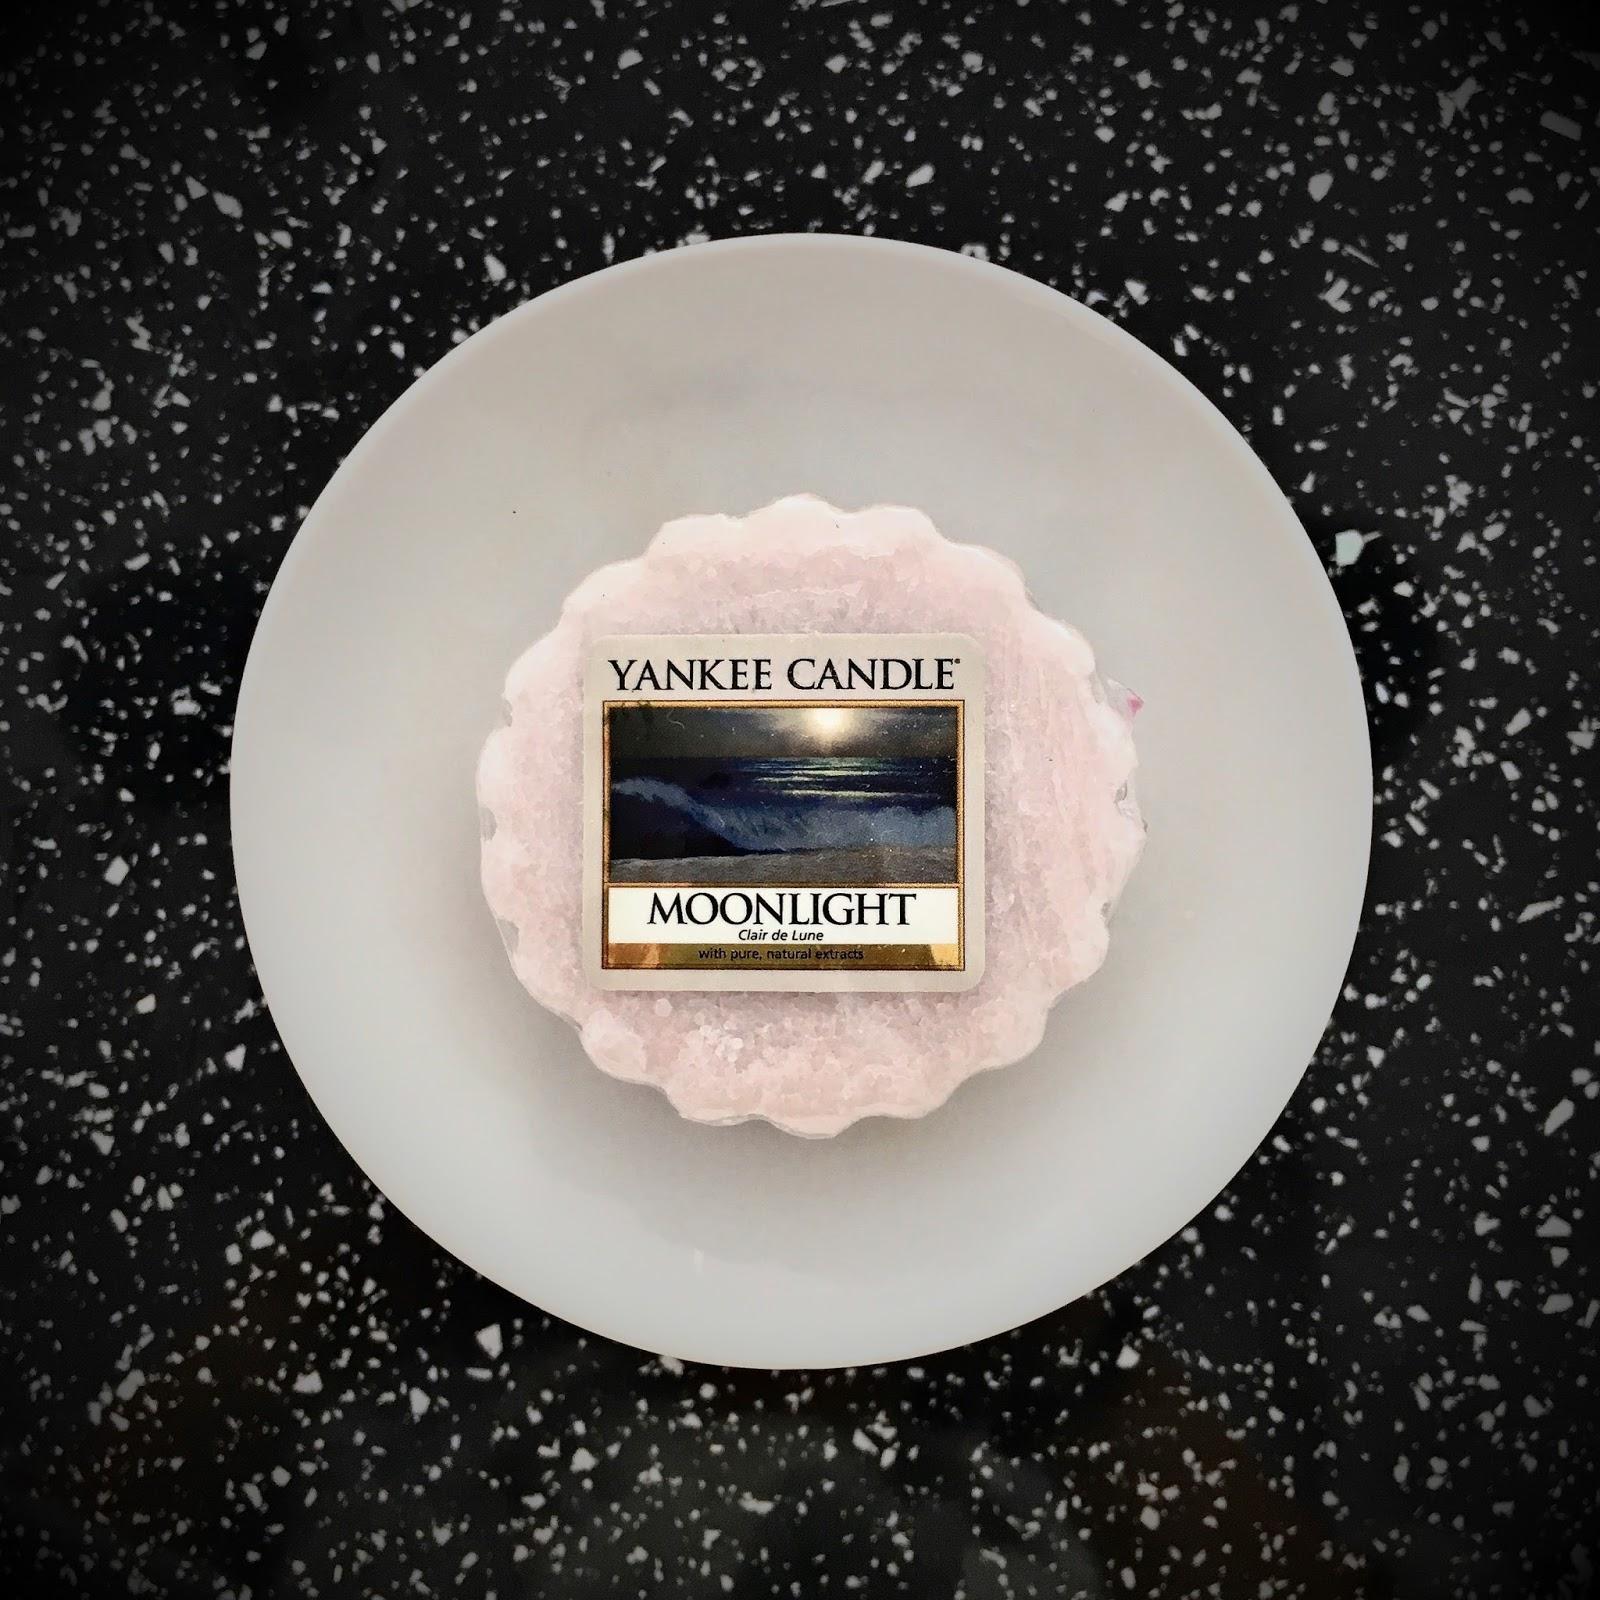 Męskie zapachy - Moonlight, Yankee Candle